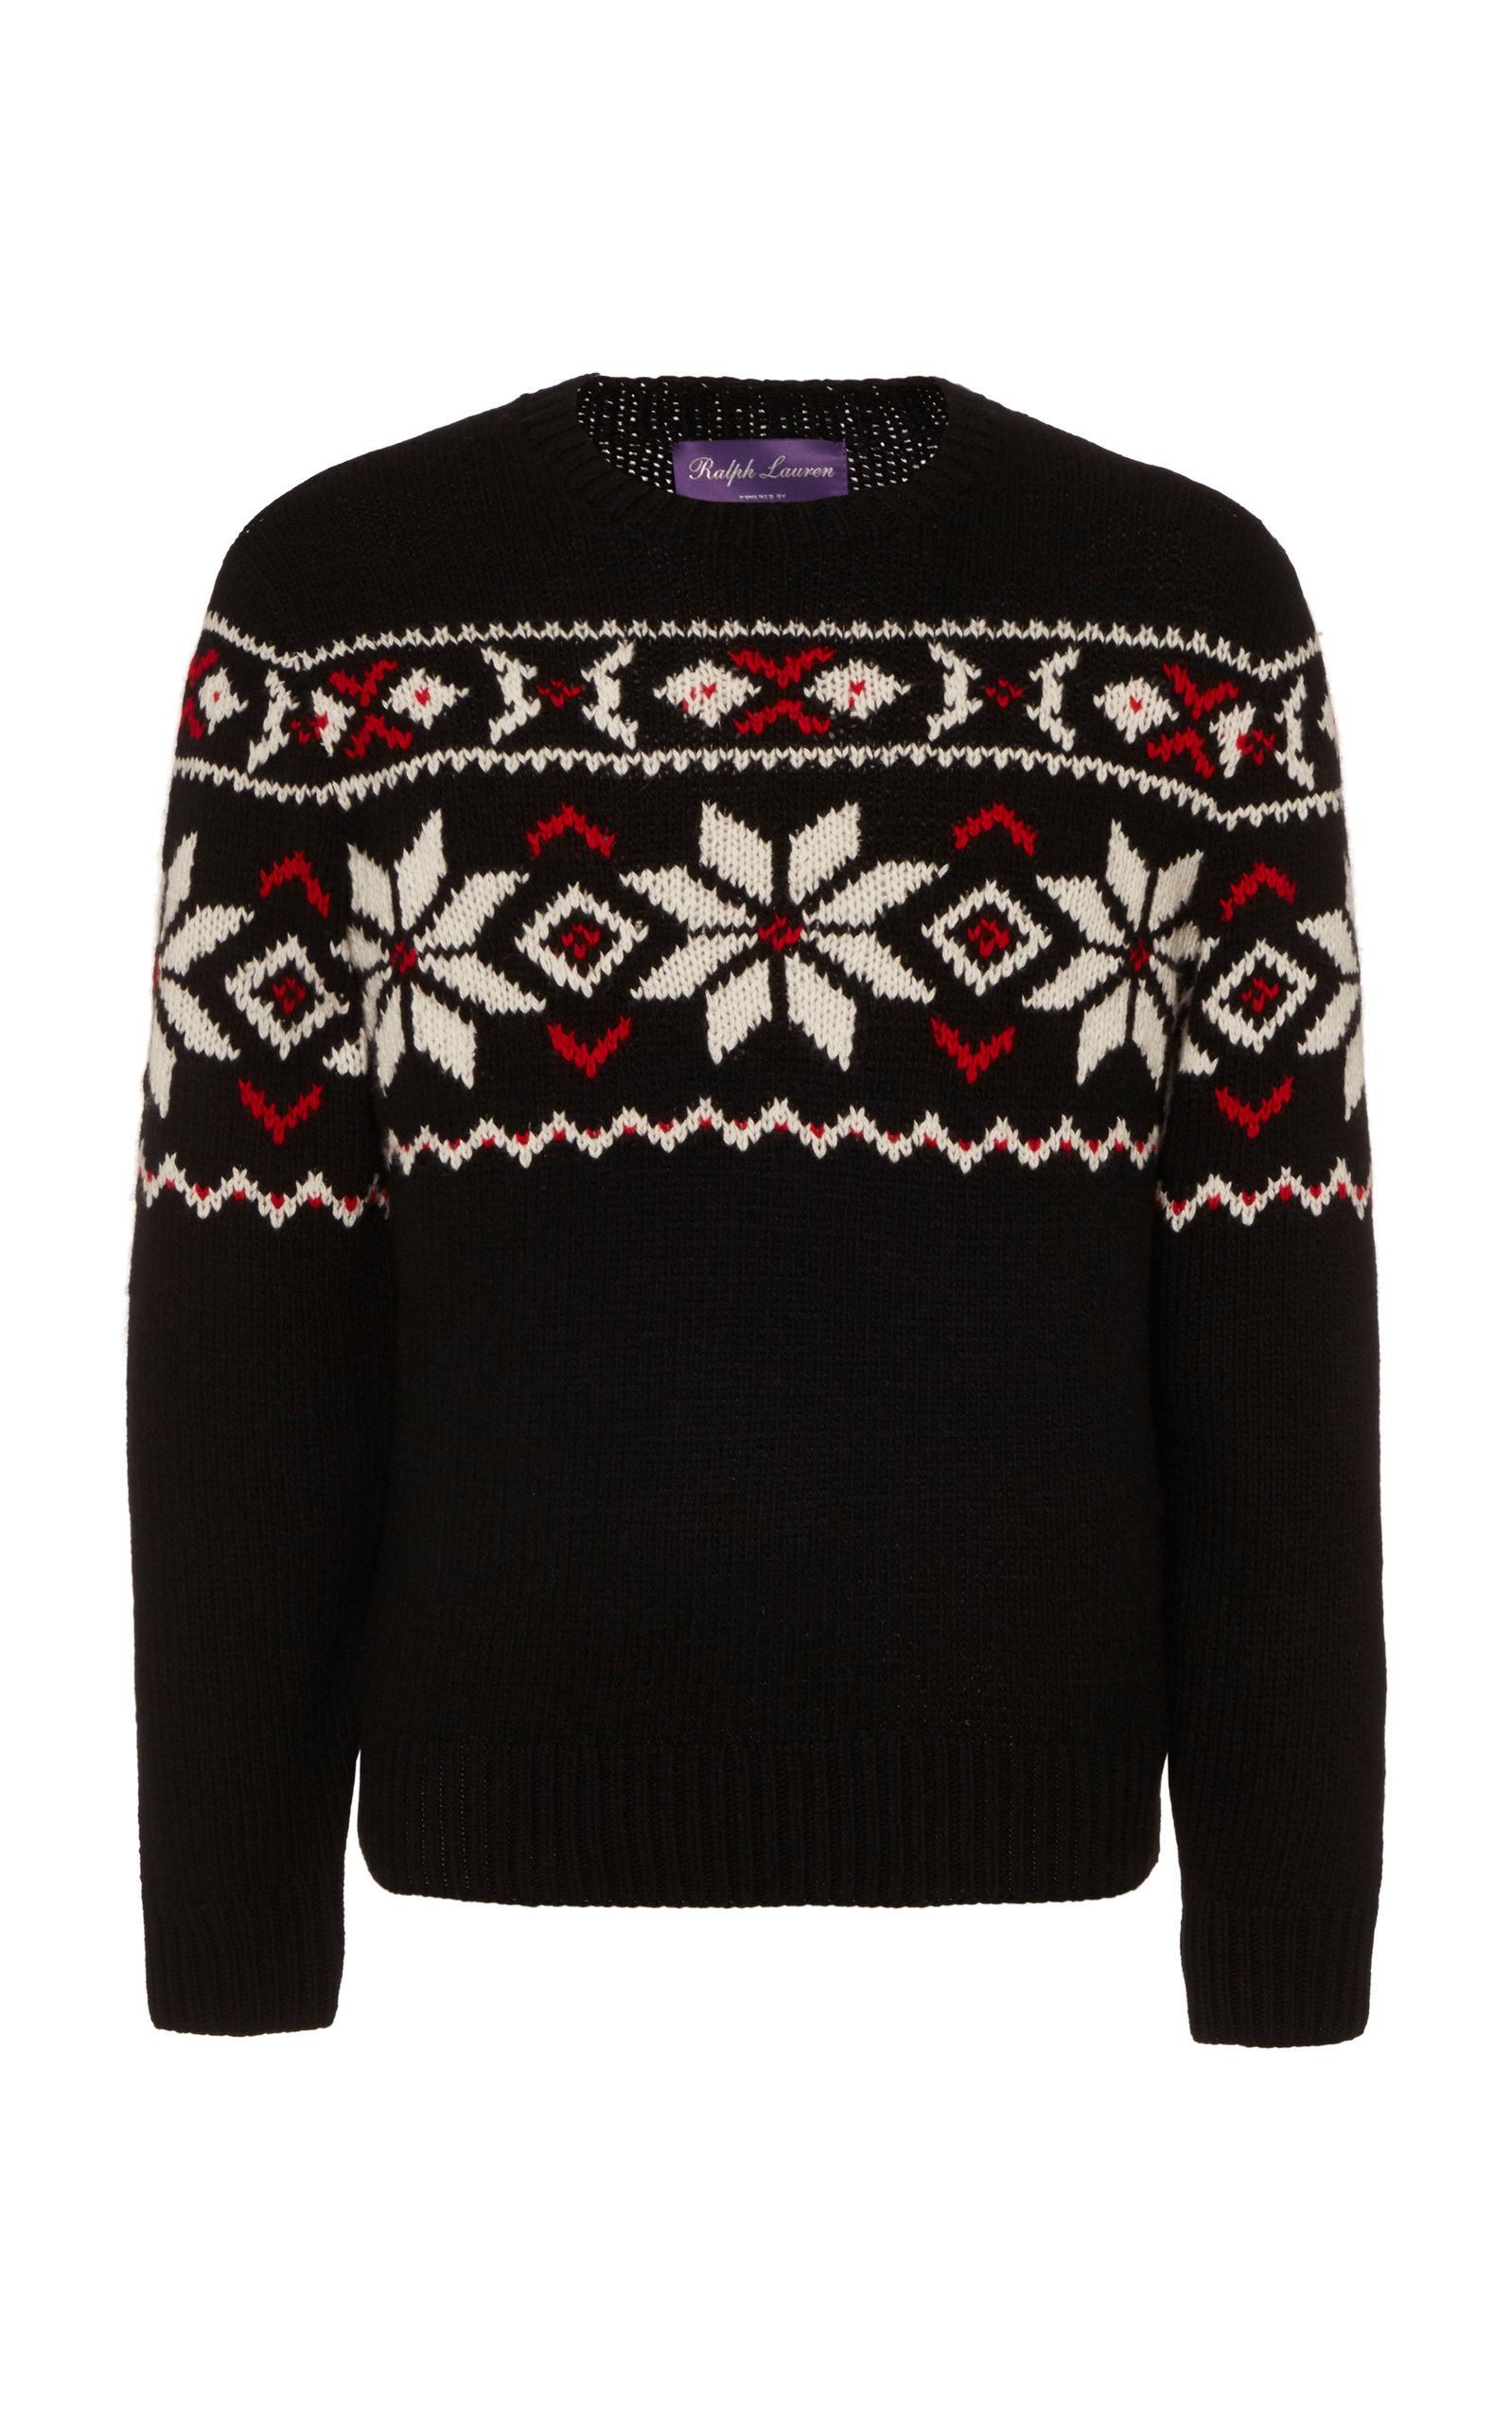 Ralph Lauren Knits Intarsia Knit Cashmere Sweater